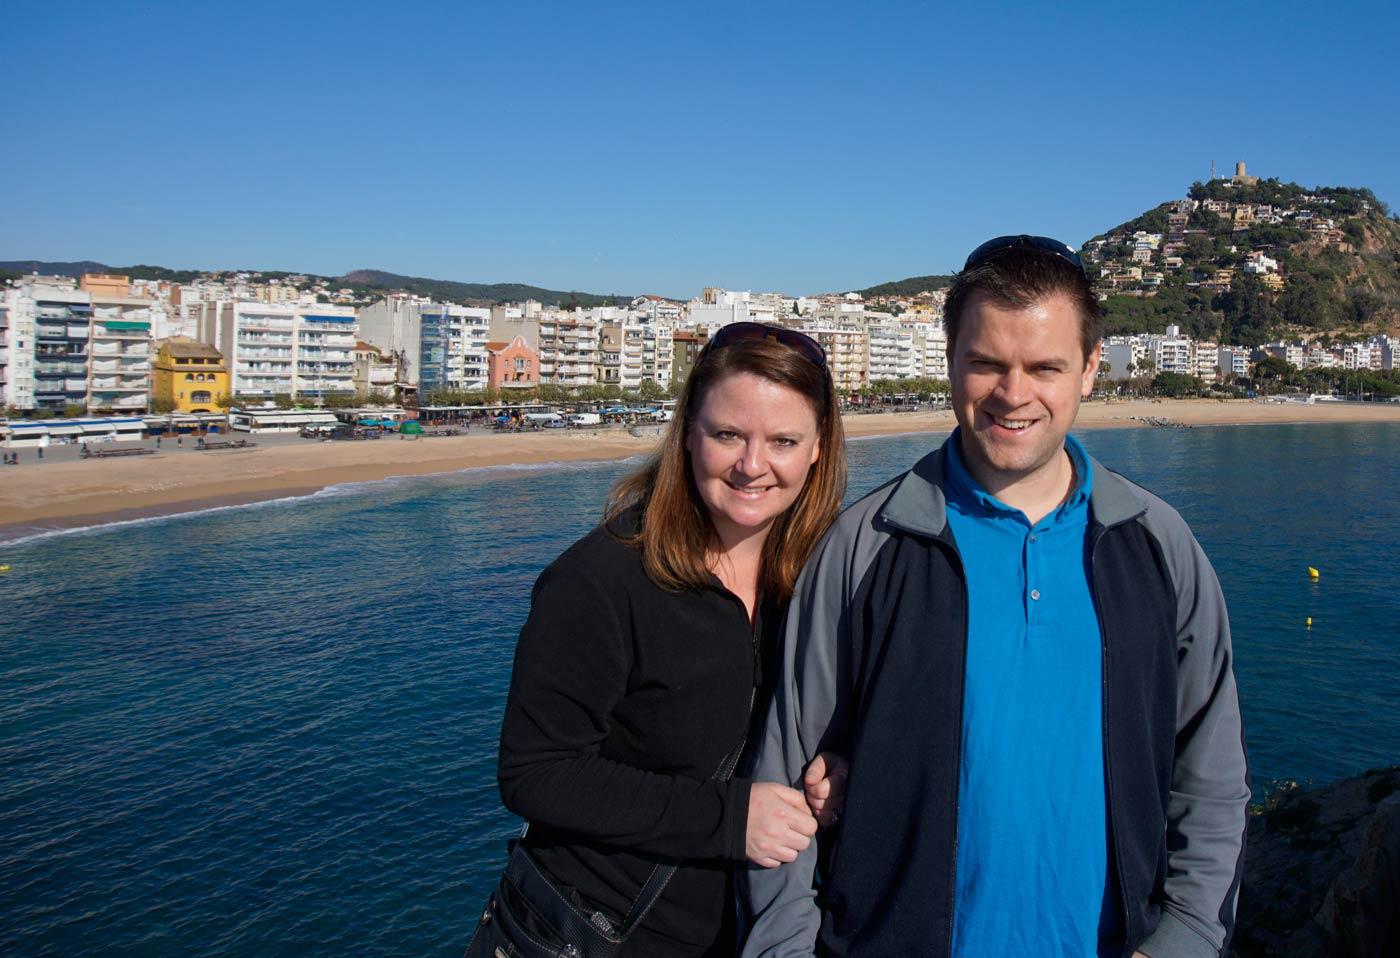 Savored Journeys in Costa Brava